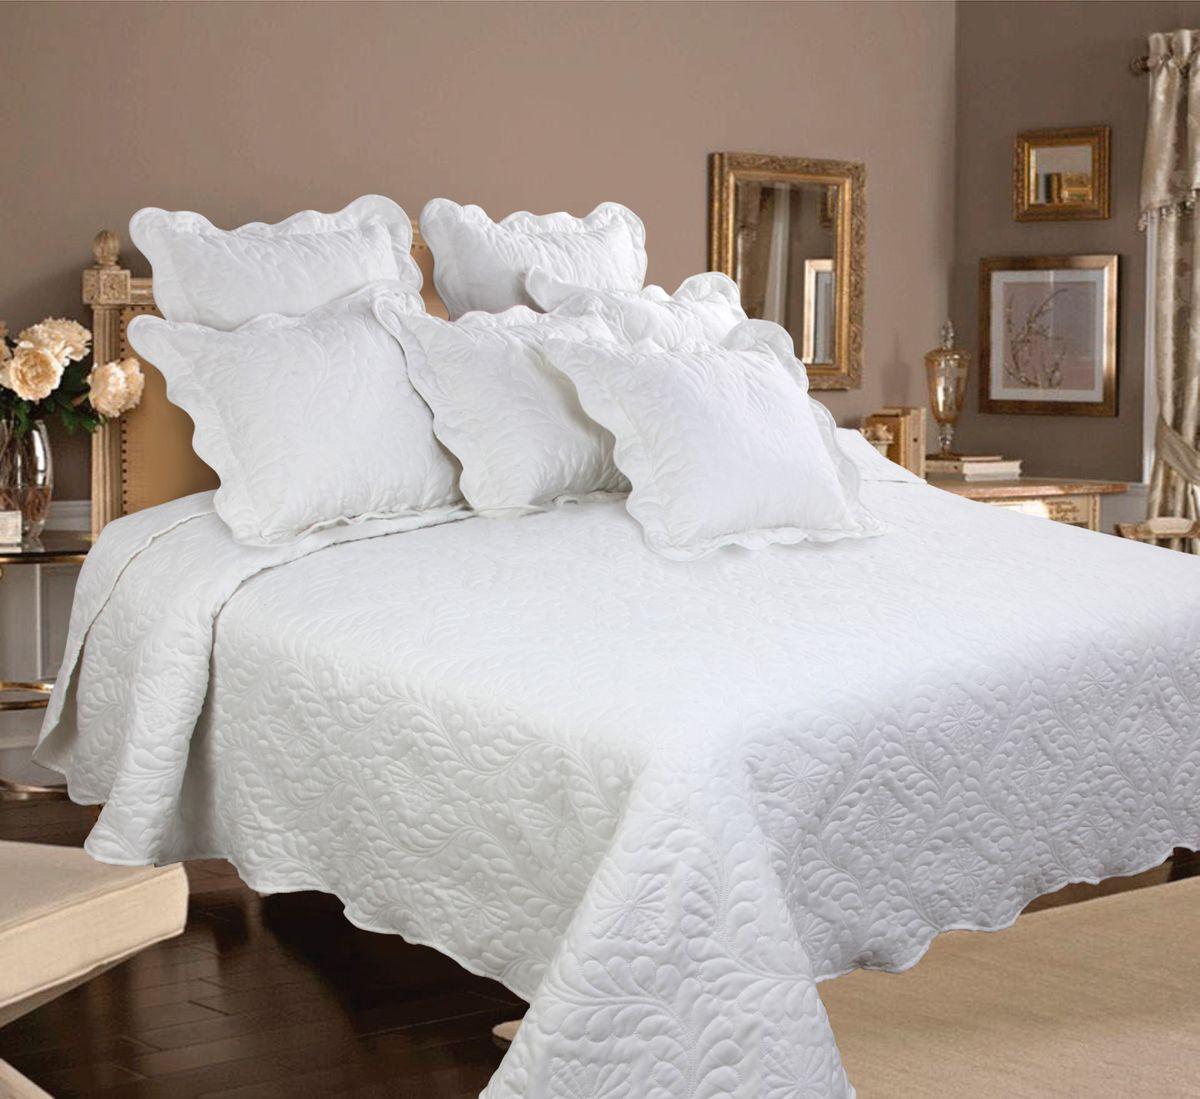 Комплект для спальни Mona Liza Royal White: покрывало 200 х 220 см, 2 наволочки 40 х 40 см, цвет: белый